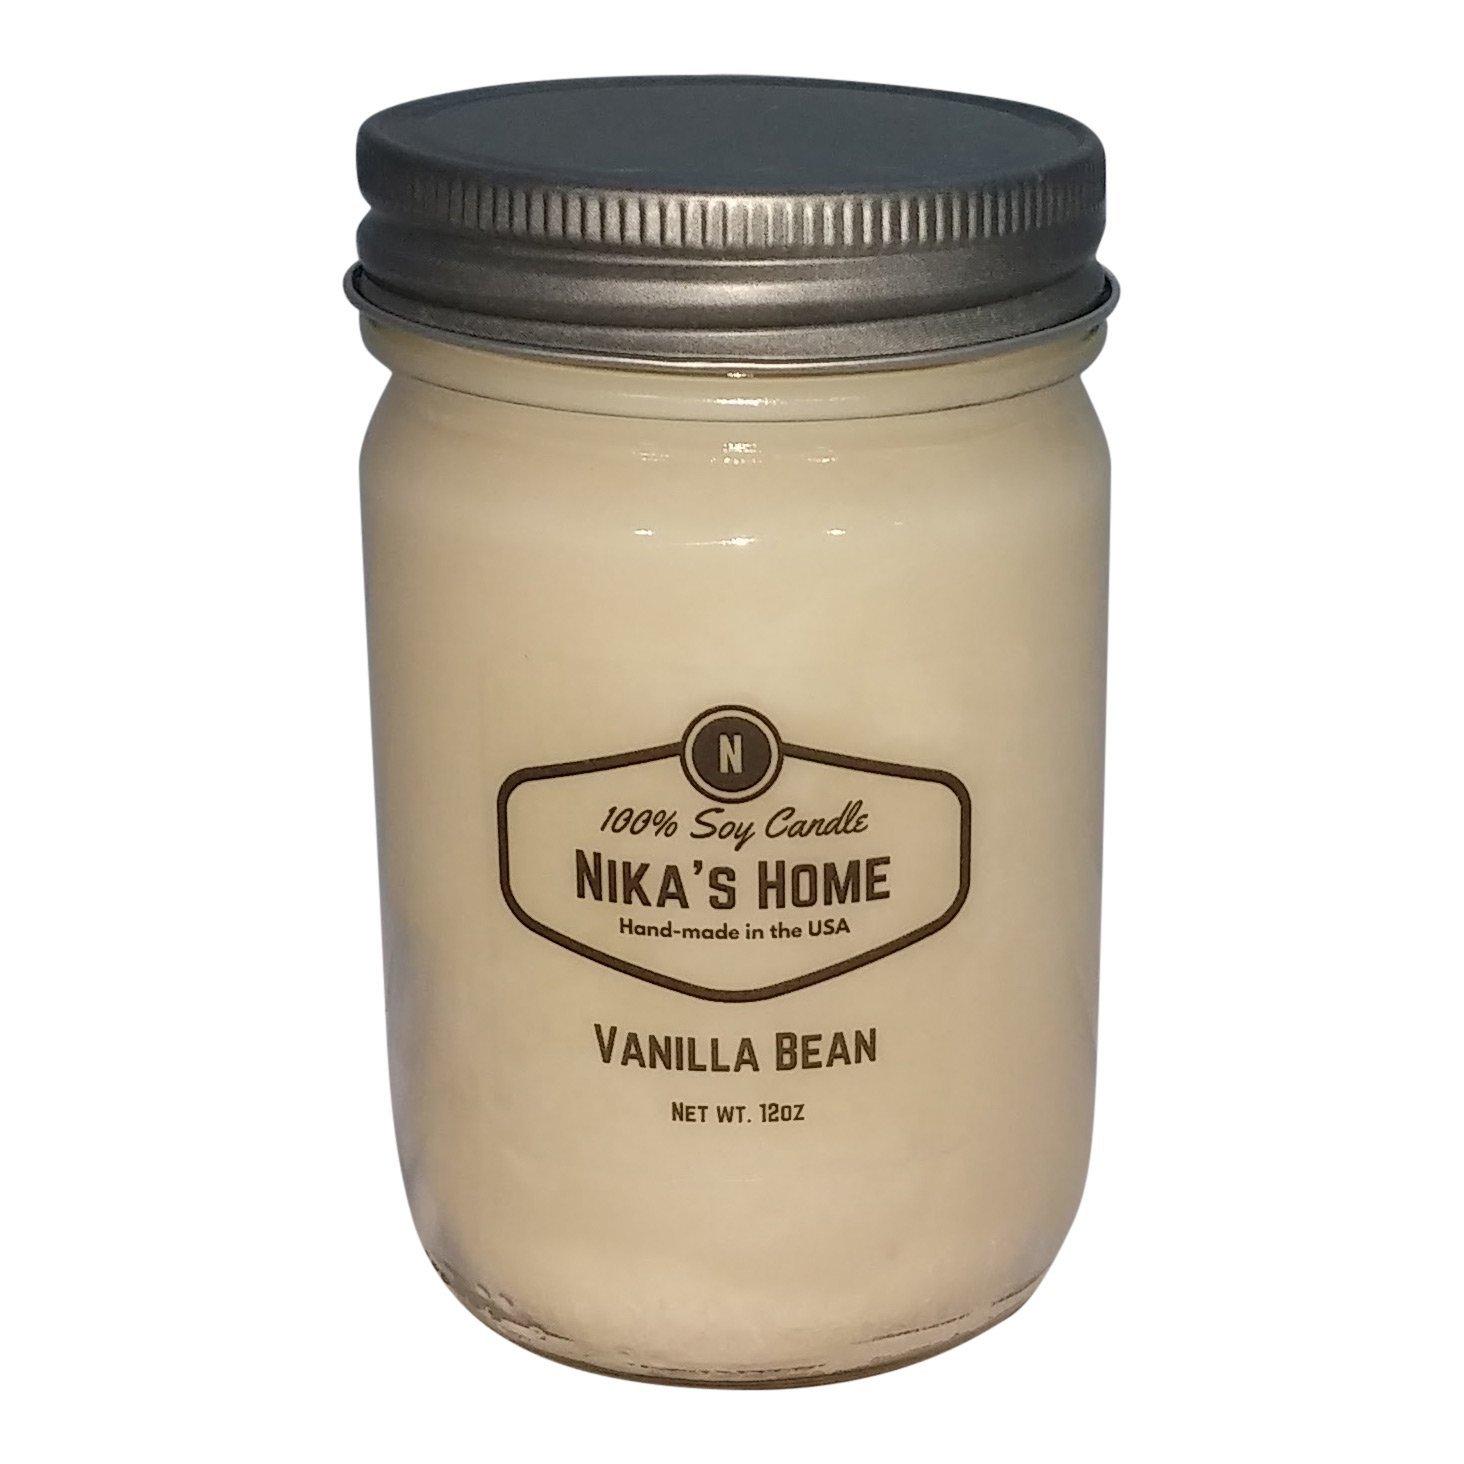 Nika's Home Vanilla Bean 12oz Mason Soy Candle by Nika's Home